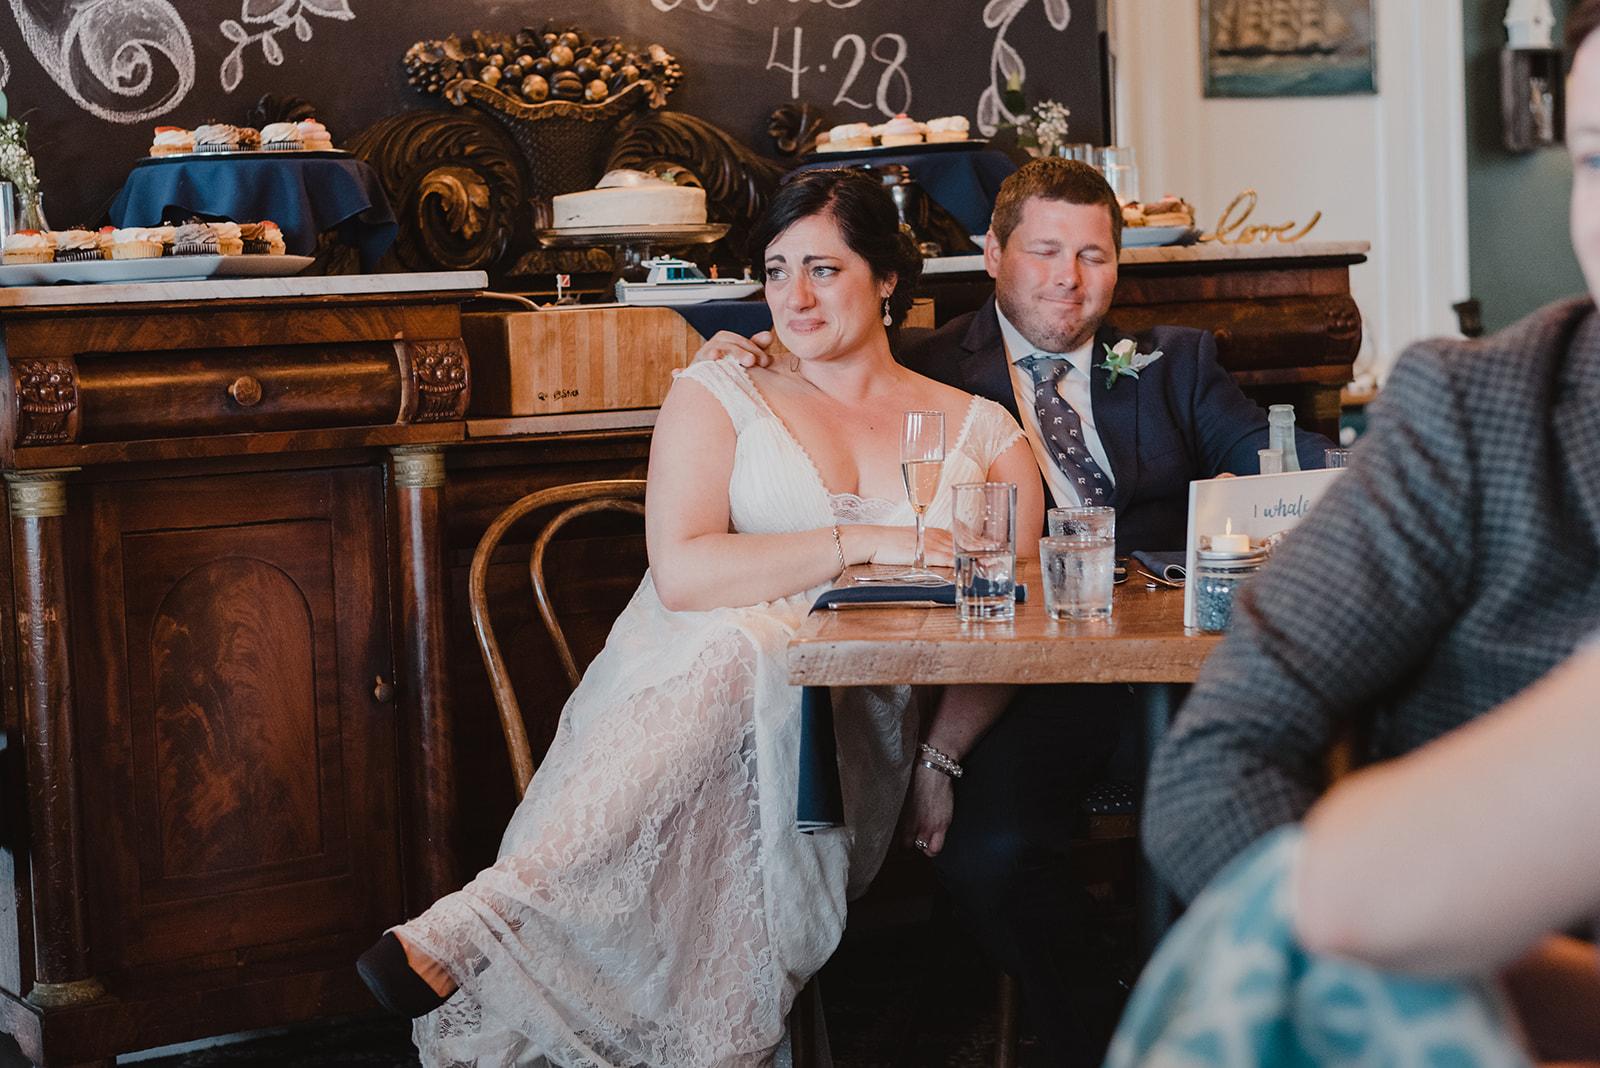 Macdonald_Wedding_ADP_2019-685.jpg